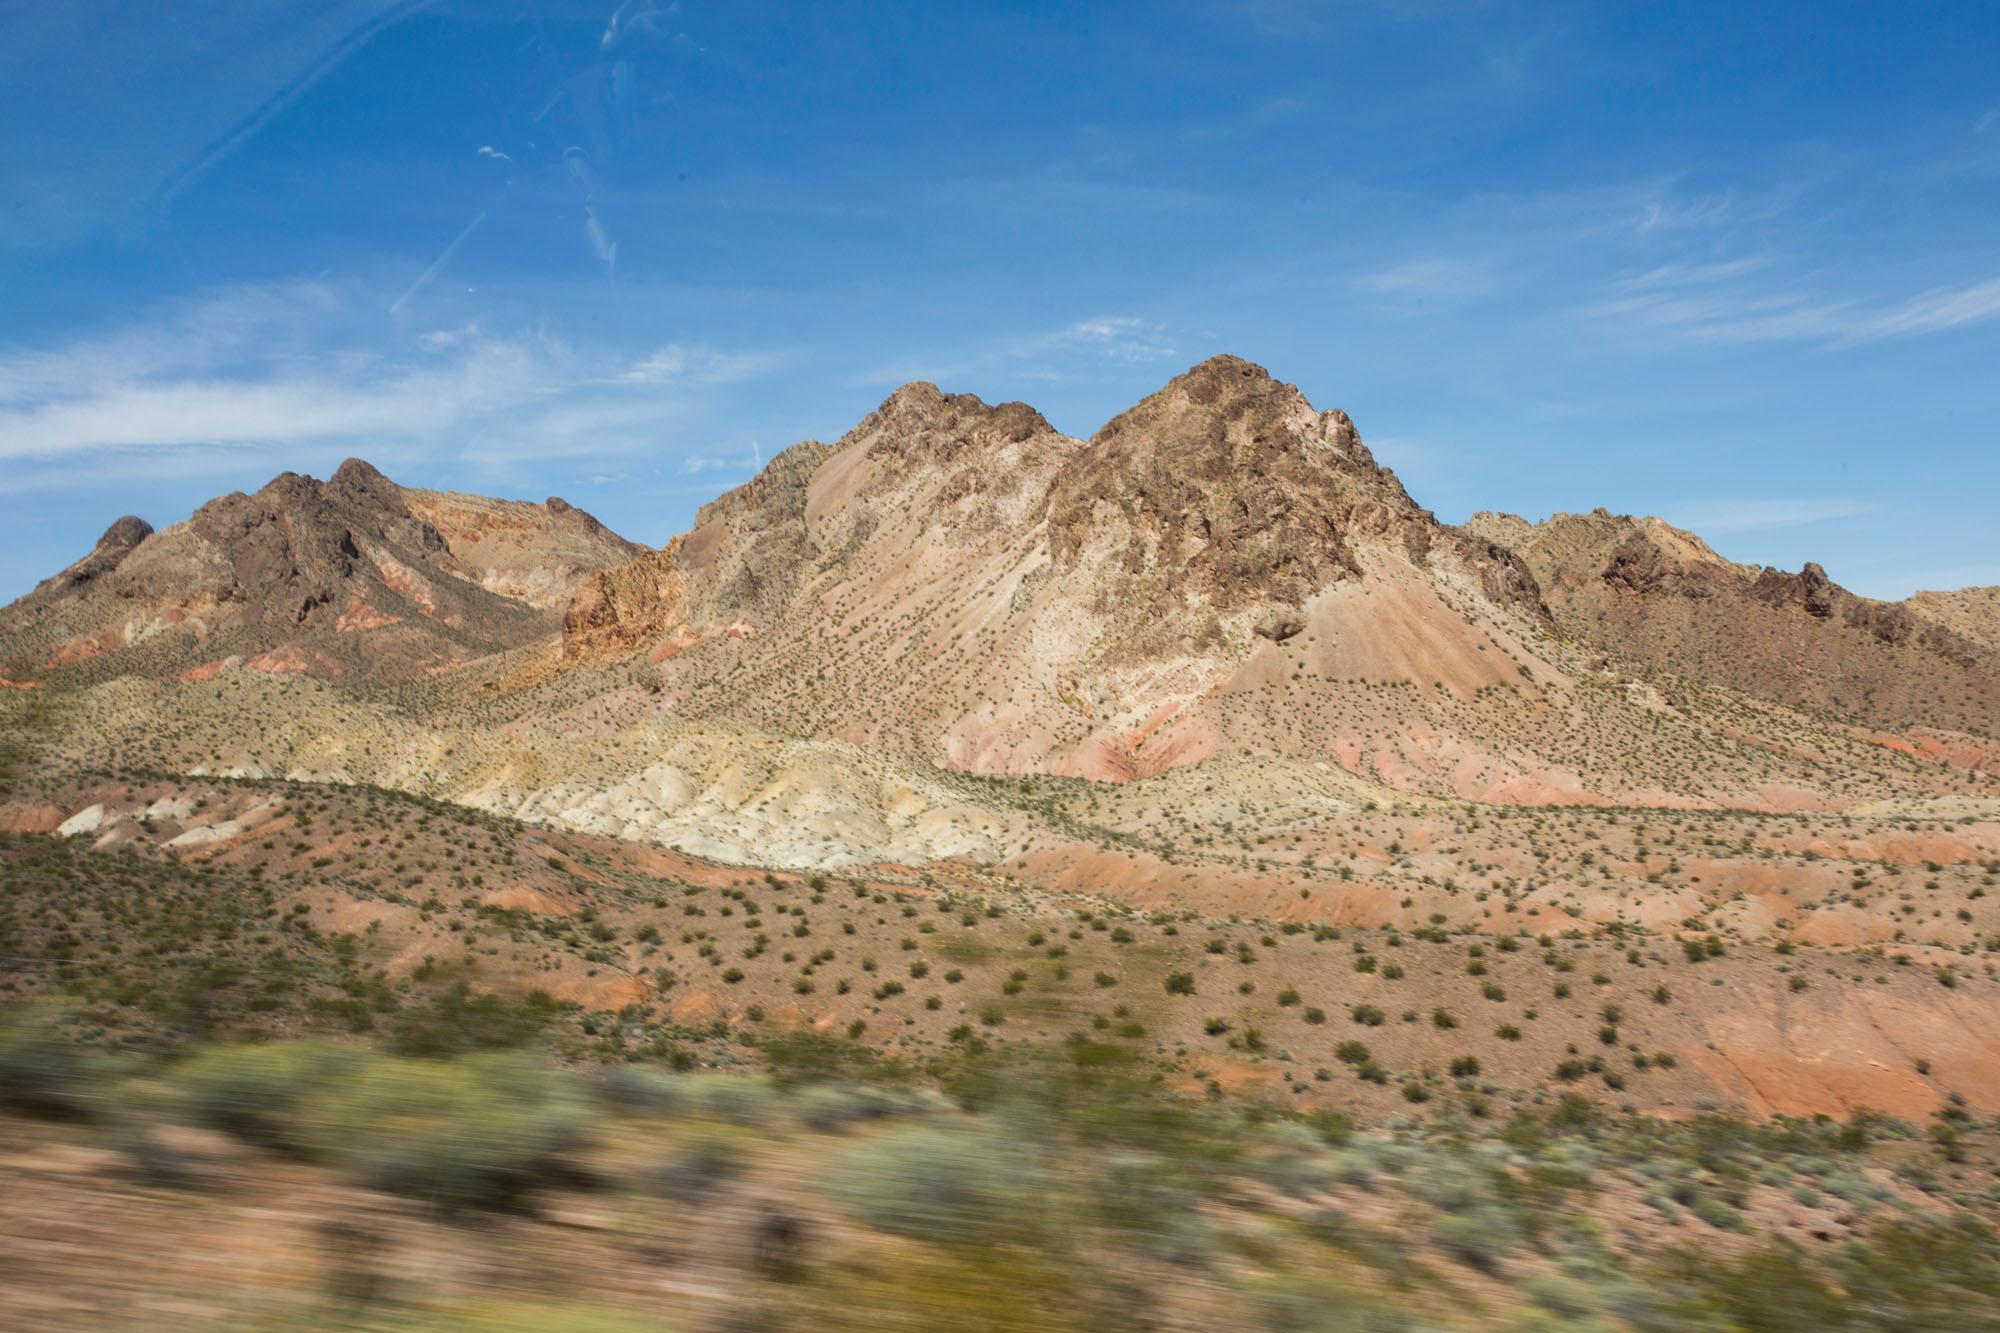 Content worth sharing: Jedidiah Jenkins 7,000 mile bike ride